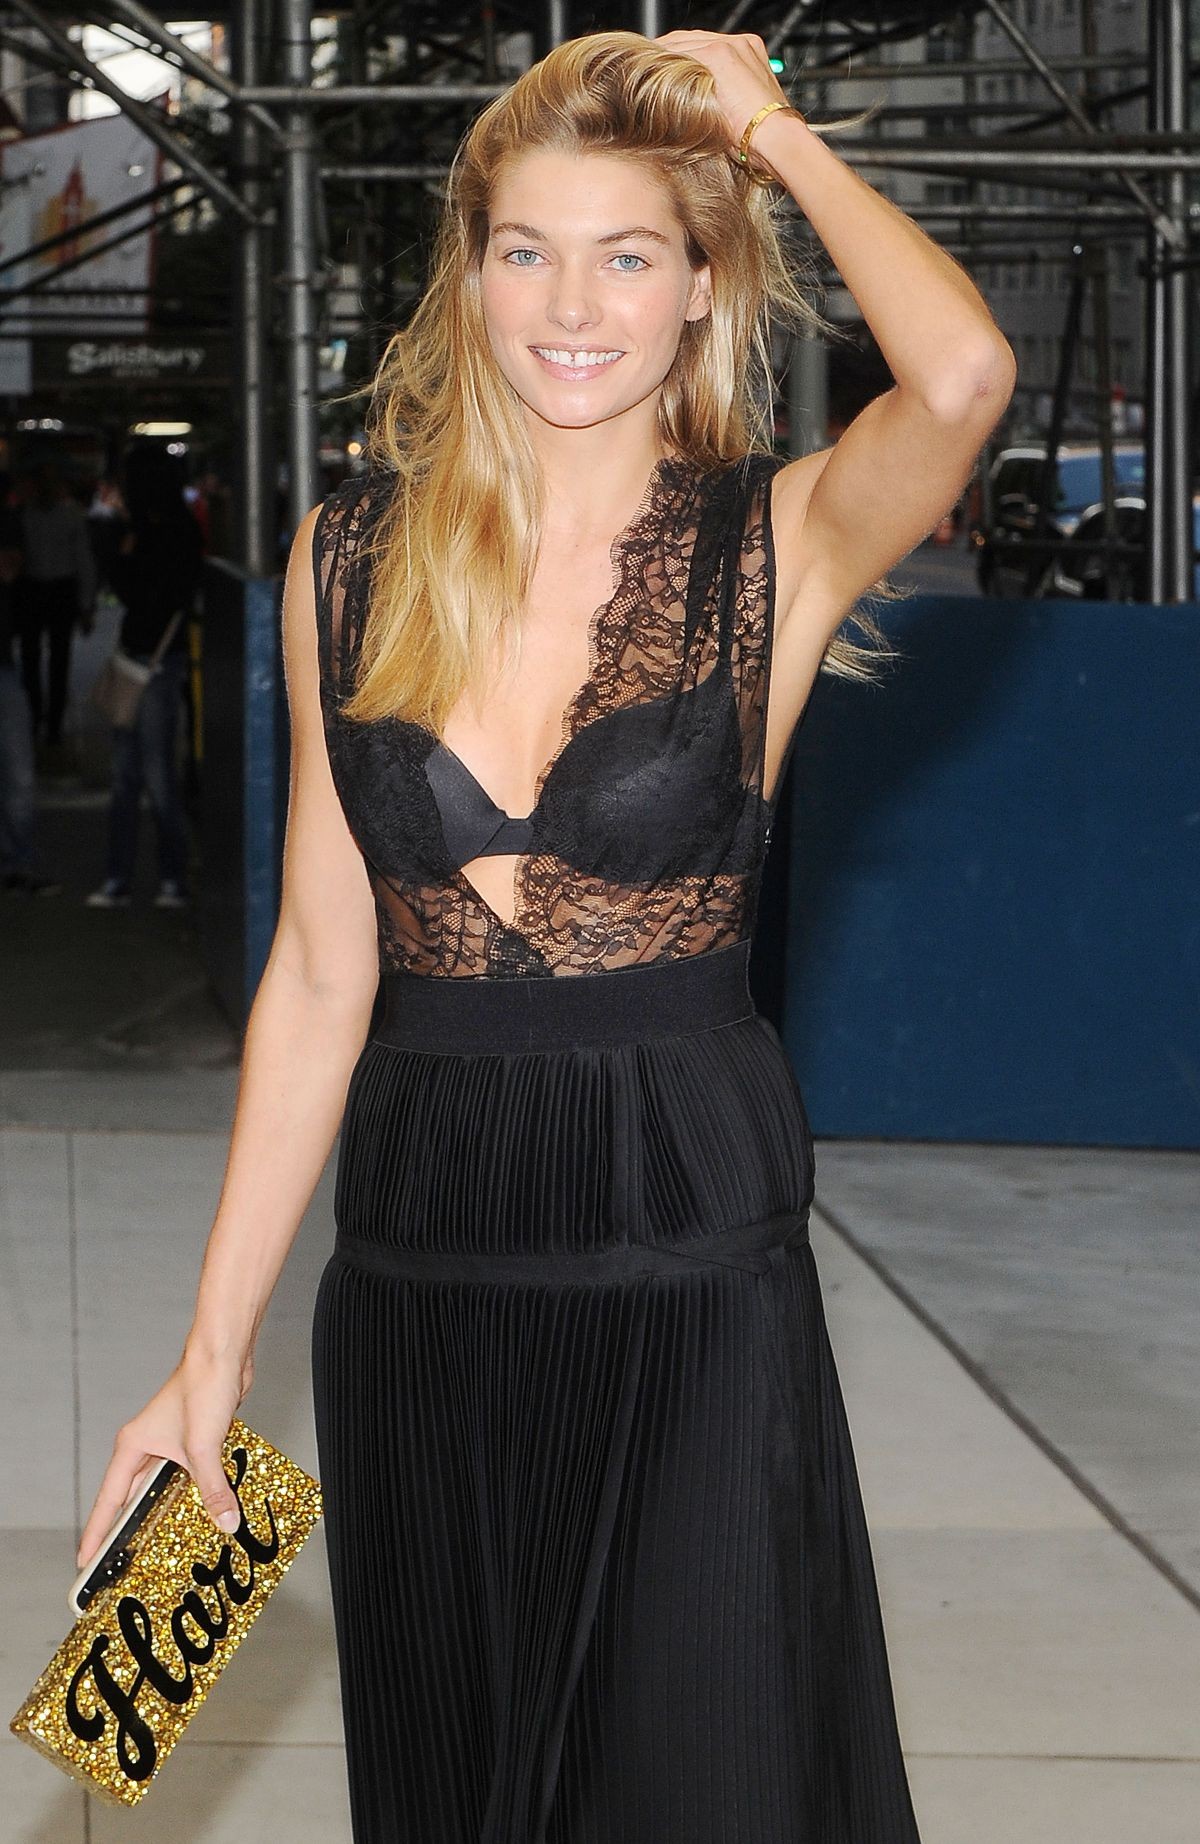 JESSICA HART at Fashion Media Awards in New York